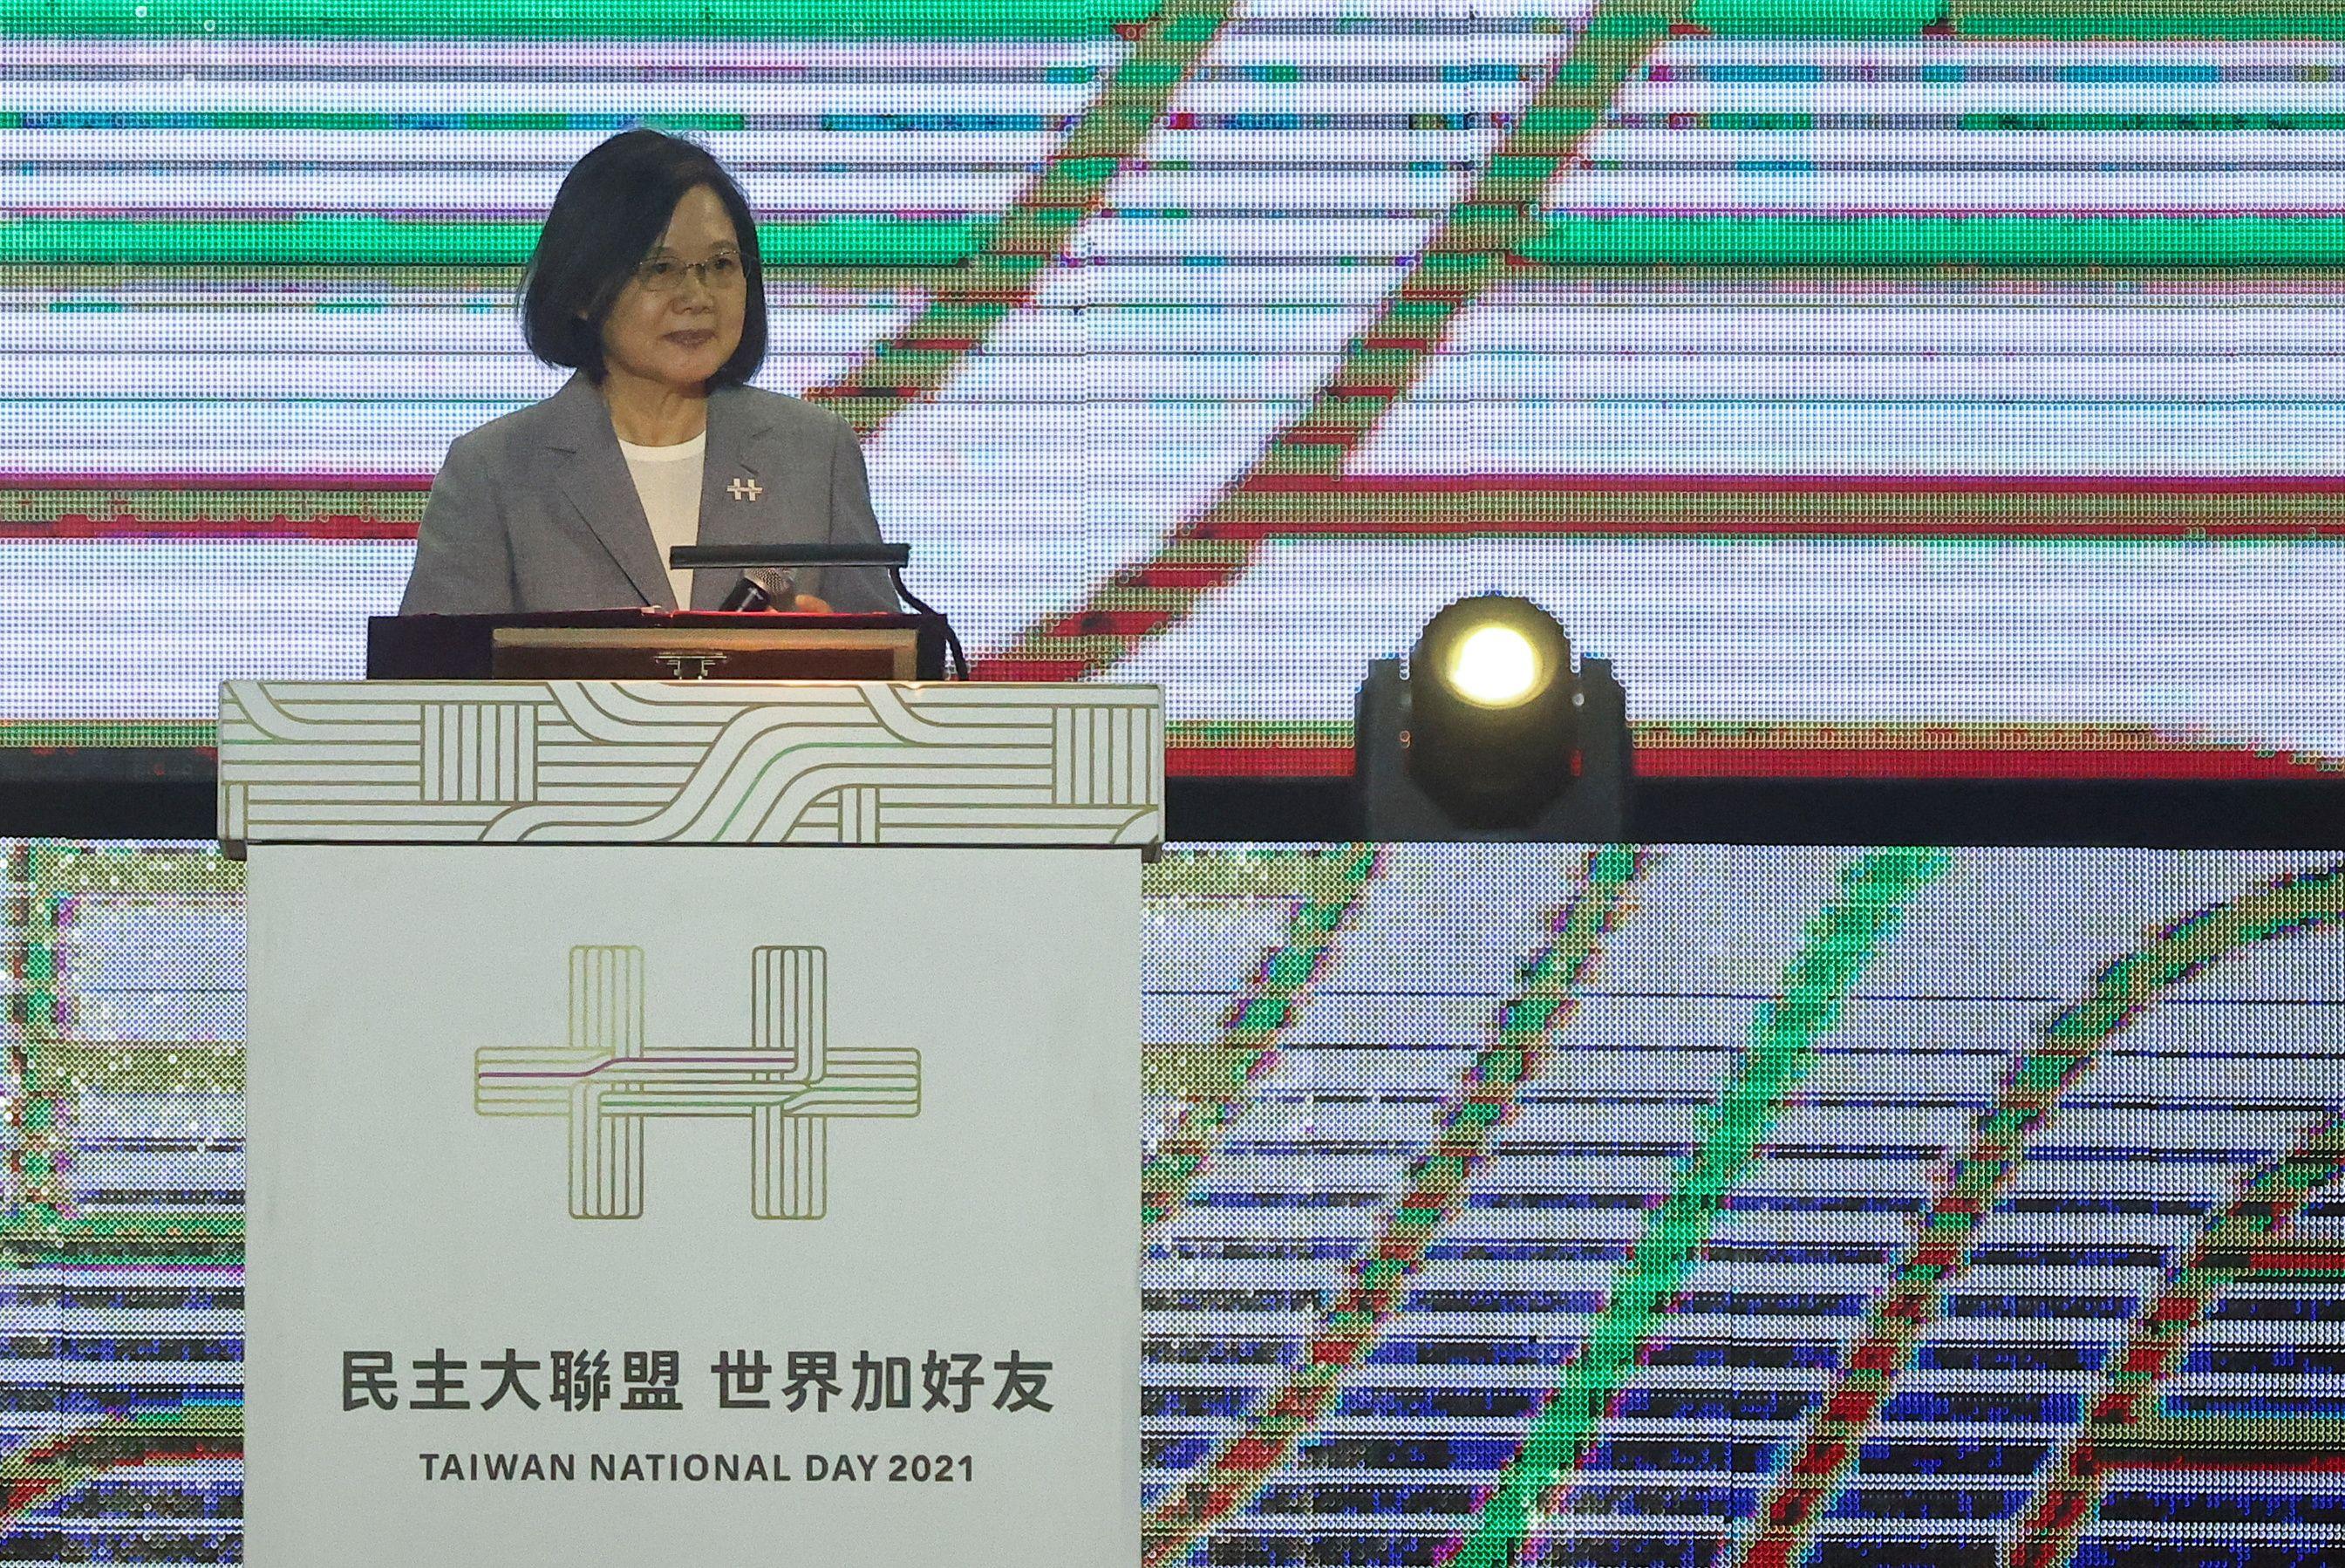 Taiwan President Tsai Ing-wen attends a gala on the eve of Taiwan's National Day at Hsinchu Air Force Base in Hsinchu, Taiwan October 9, 2021. REUTERSN/Ann Wang